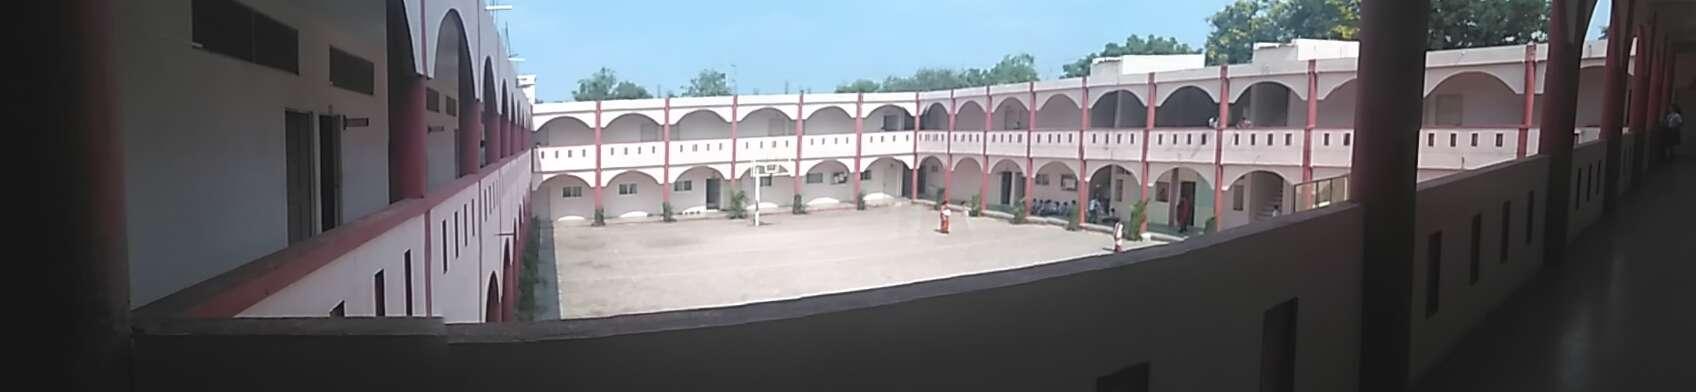 PIONEER CONVENT SCHOOL MAHALAXMI NAGAR OPP BOMBAY HOSPITAL RING ROAD INDORE MADHYA PRADESH 1030162